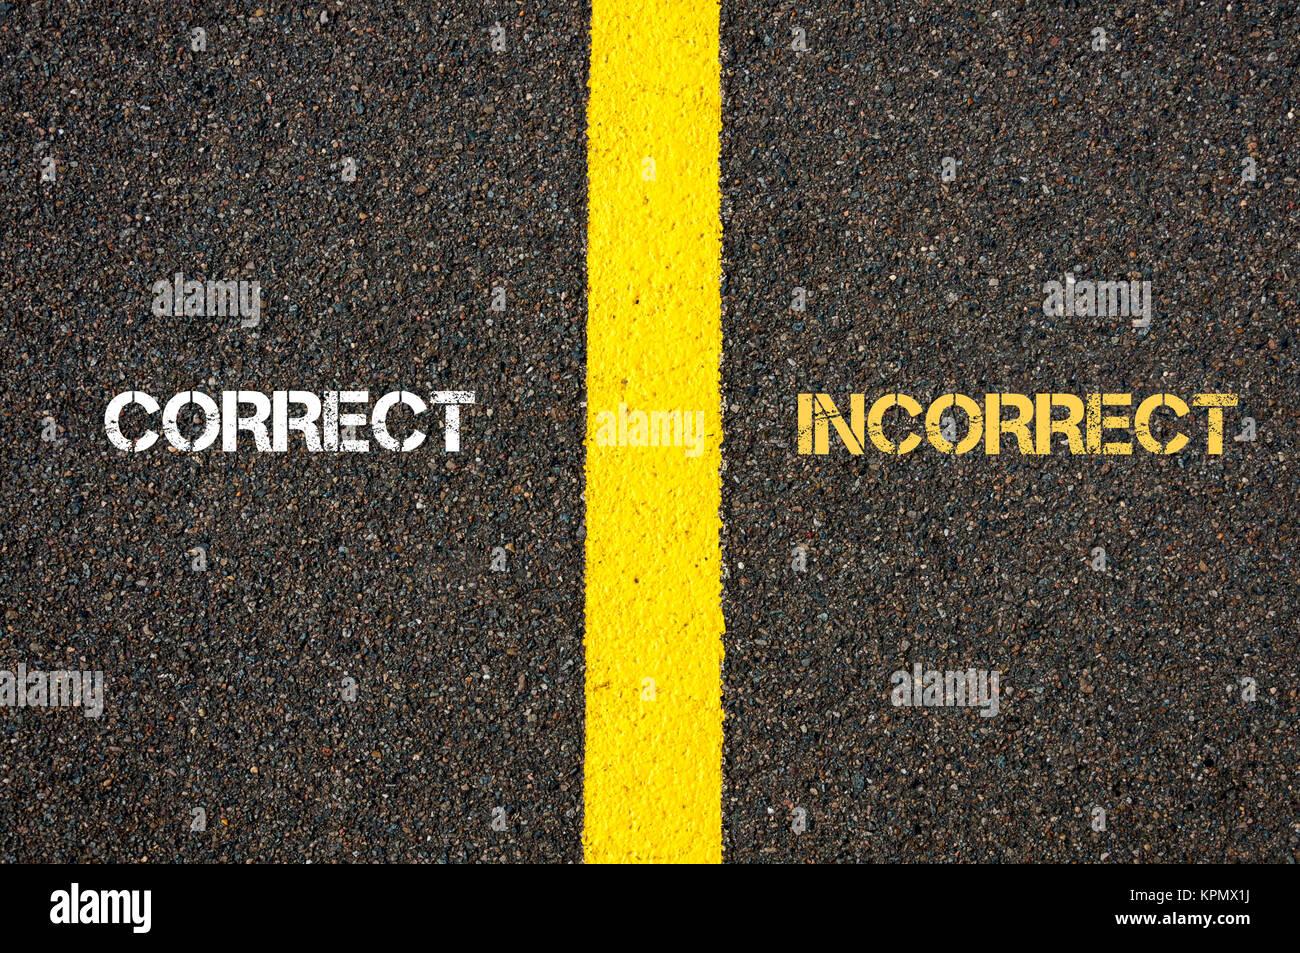 Antonym concept of CORRECT versus INCORRECT - Stock Image